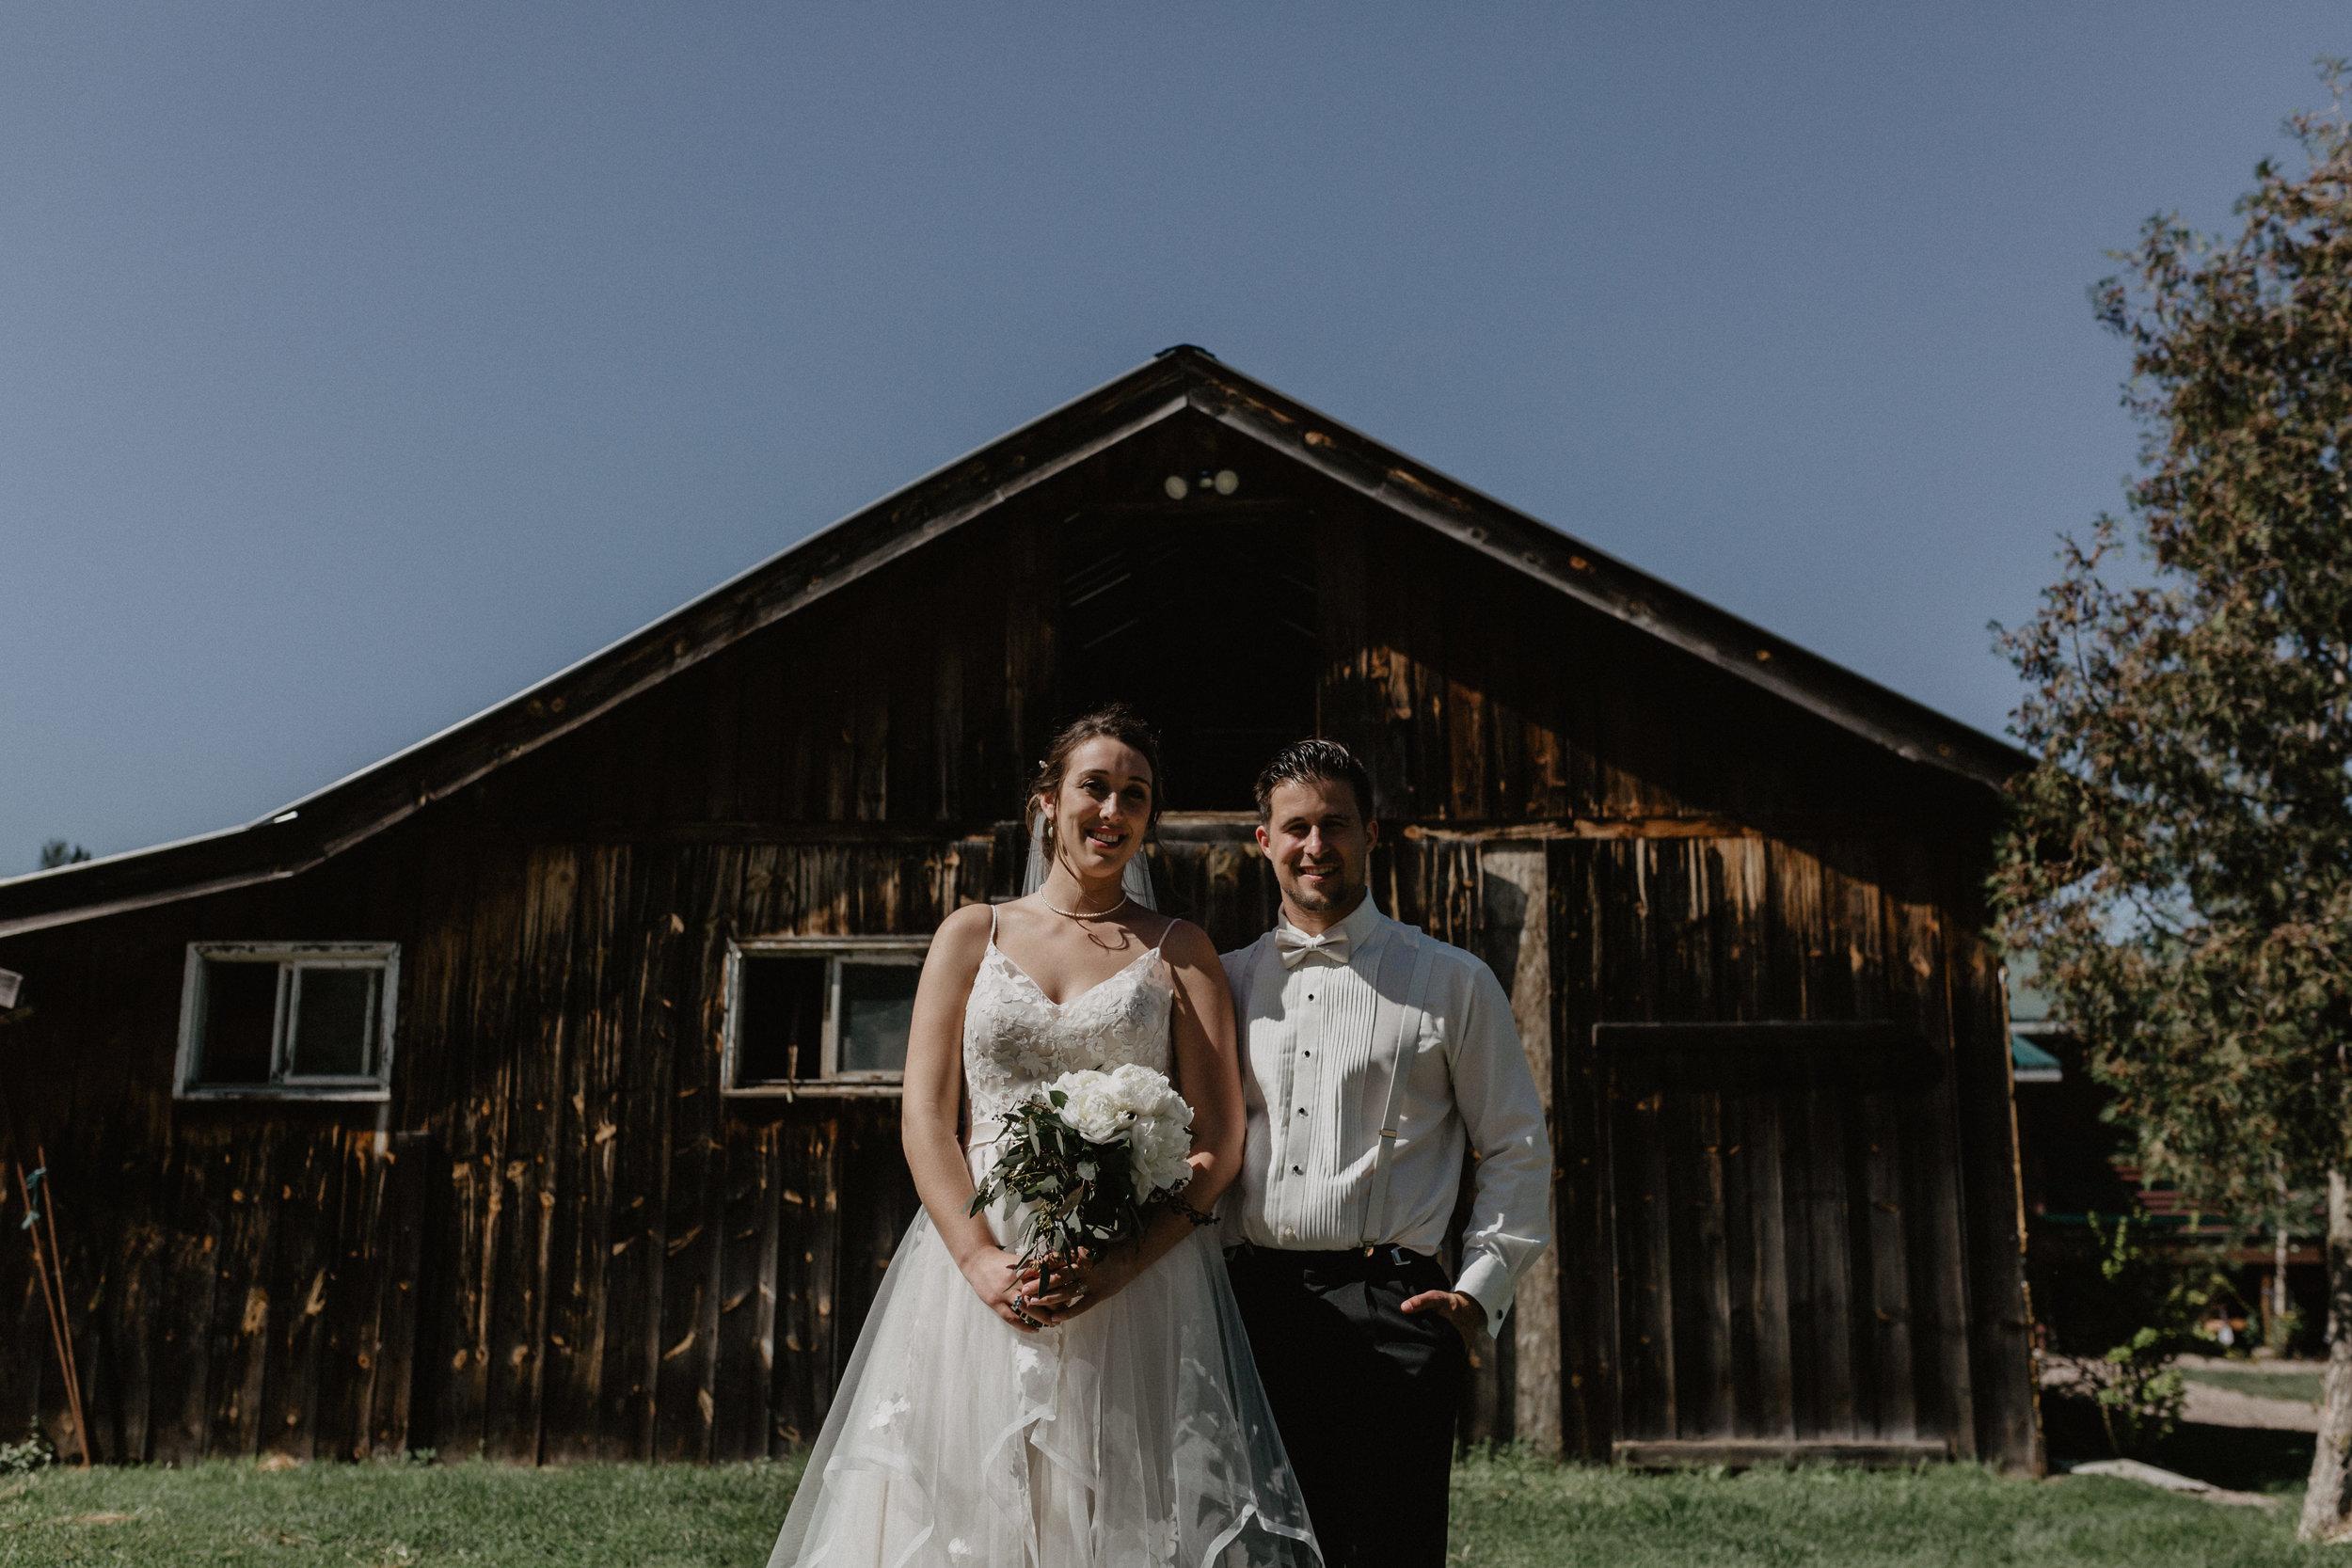 upstate_ny_wedding-56.jpg